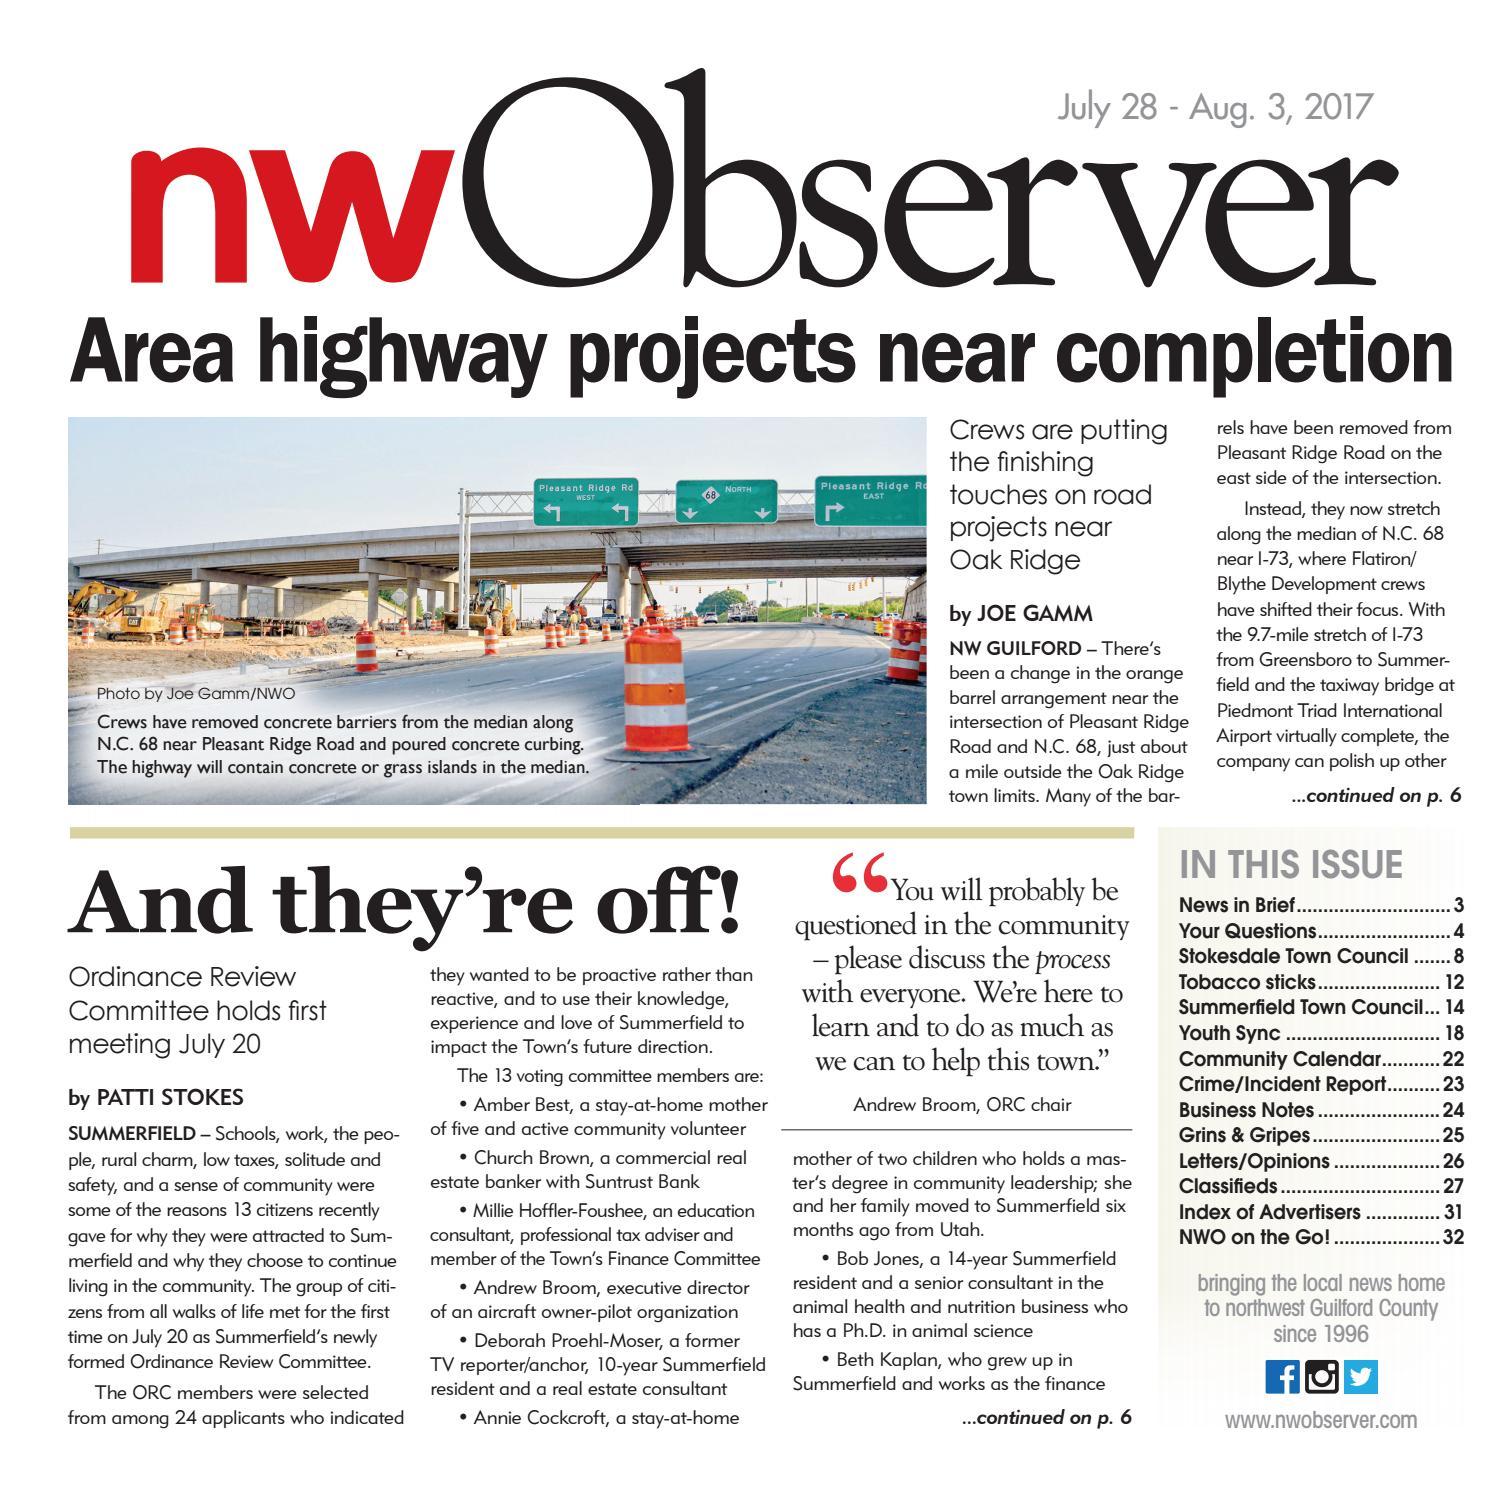 Northwest observer july 28 aug 3 2017 by pscommunications northwest observer july 28 aug 3 2017 by pscommunications issuu 1betcityfo Choice Image